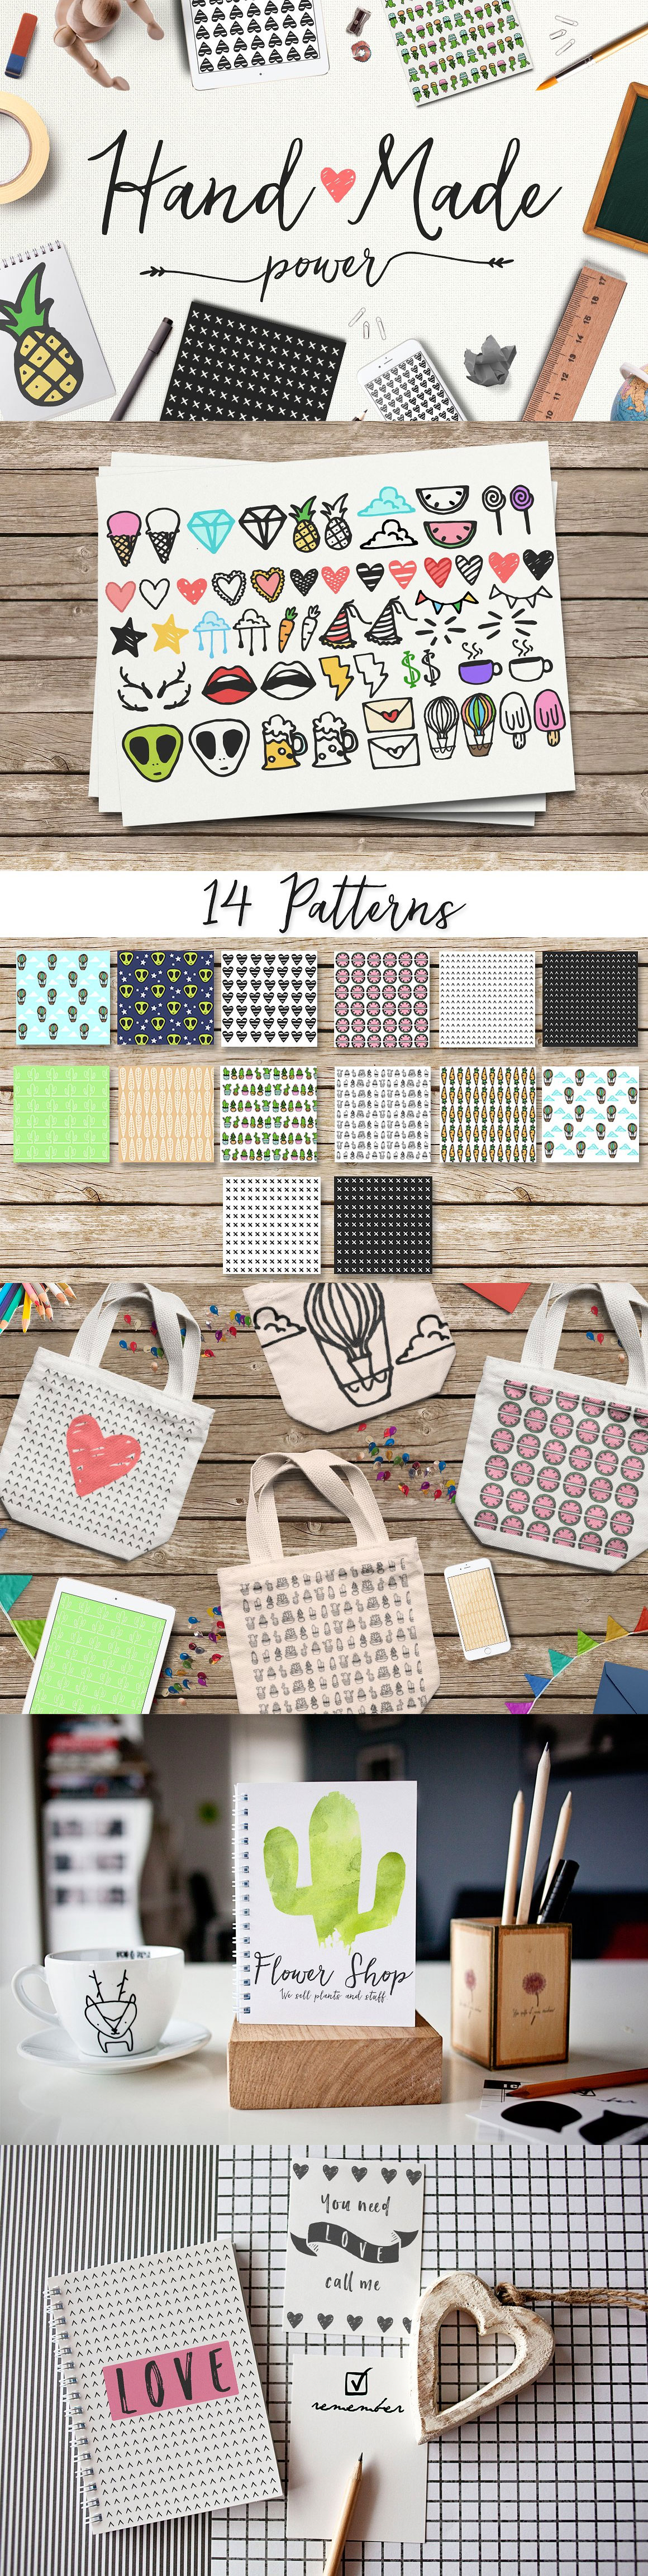 Scrapbook ideas and quotes - Over 150 Free Handmade Doodles Scrapbook Ideas Inspiration